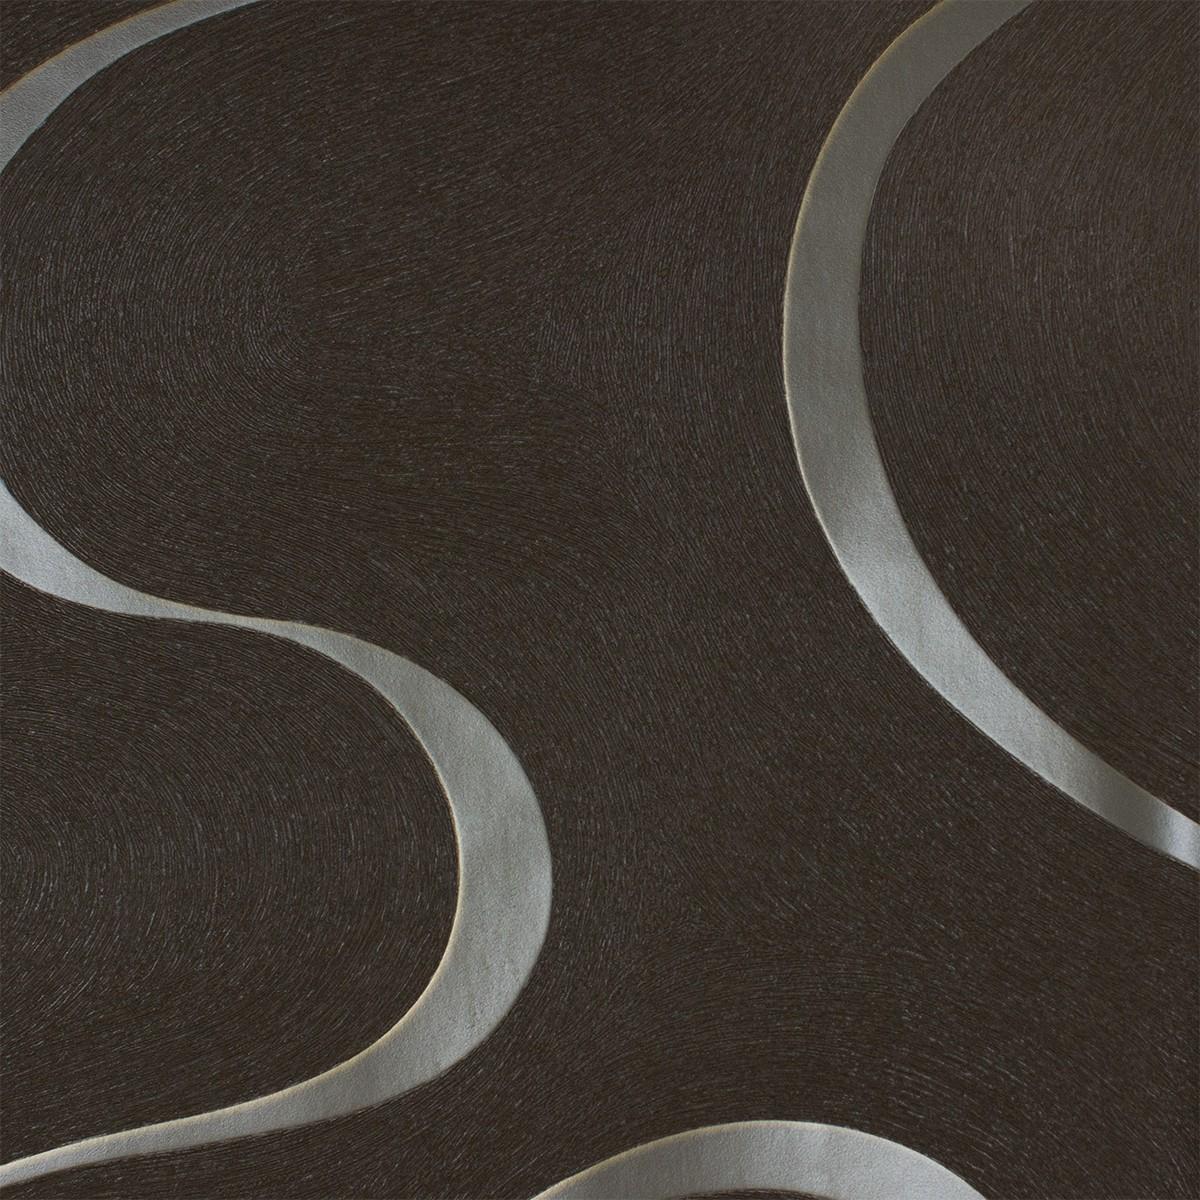 luigi colani visions vliestapete marburg tapete 53364 struktur braun. Black Bedroom Furniture Sets. Home Design Ideas